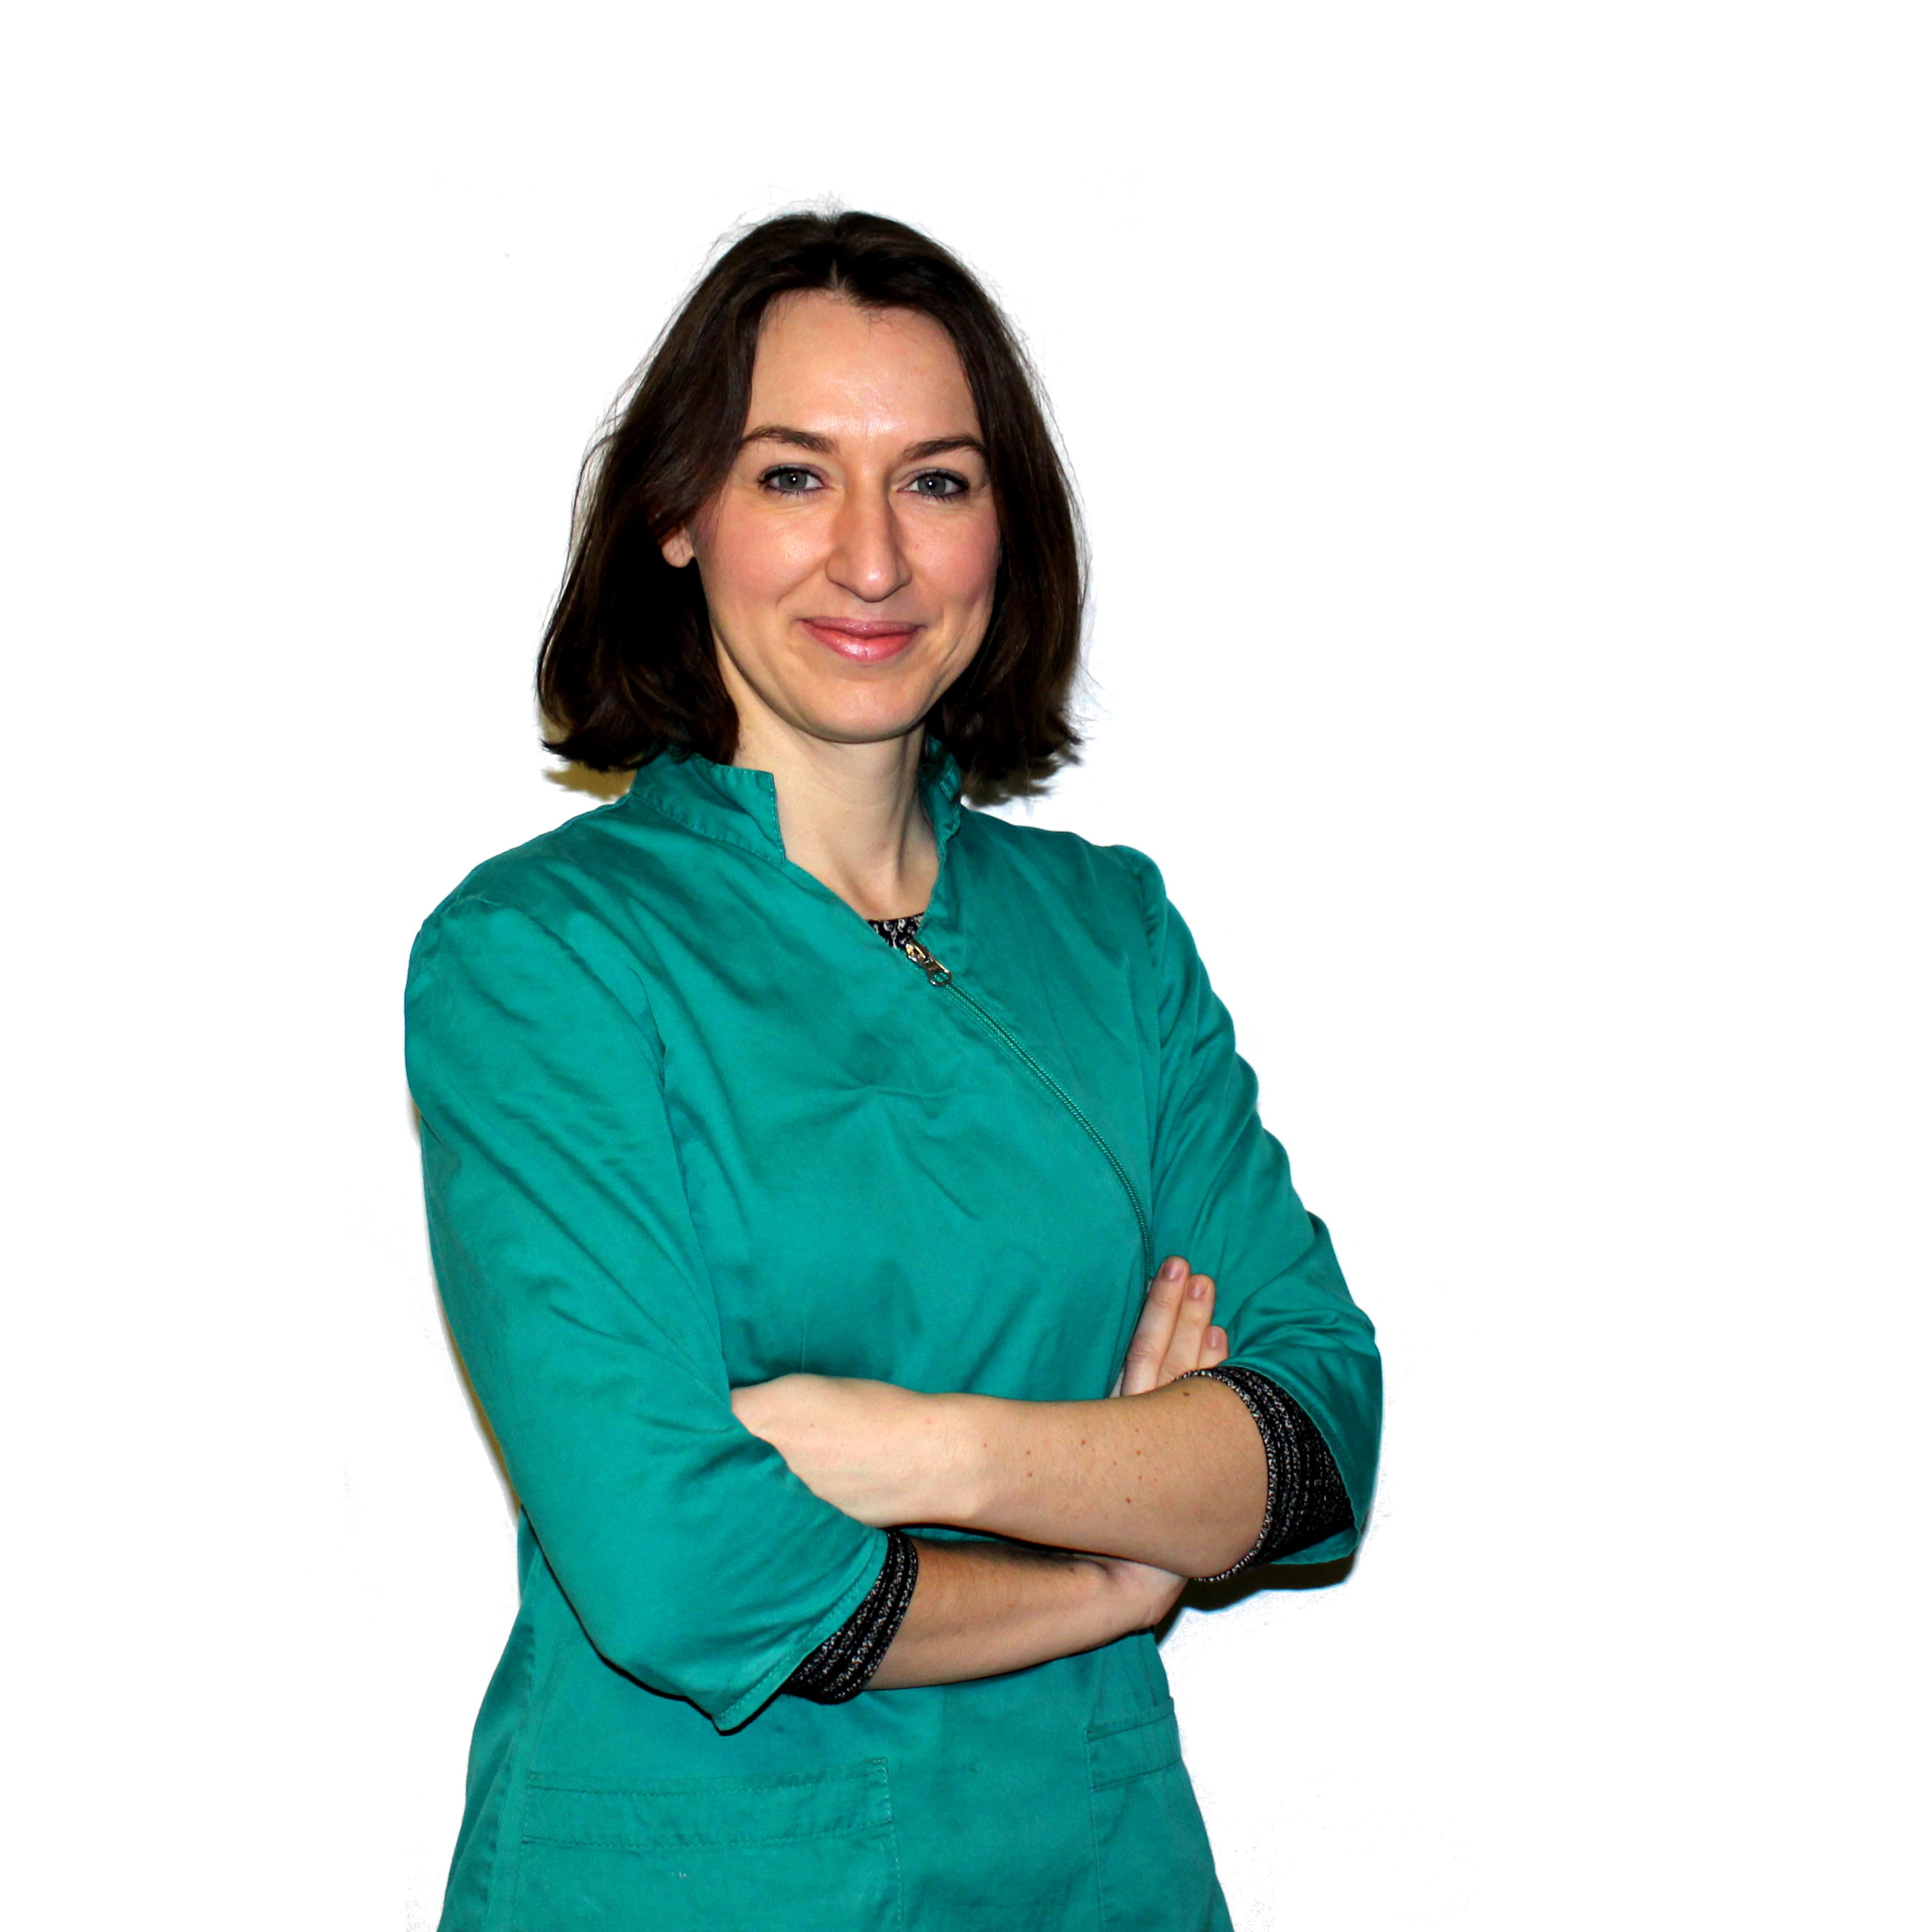 Dierenarts Lydia Muyshondt